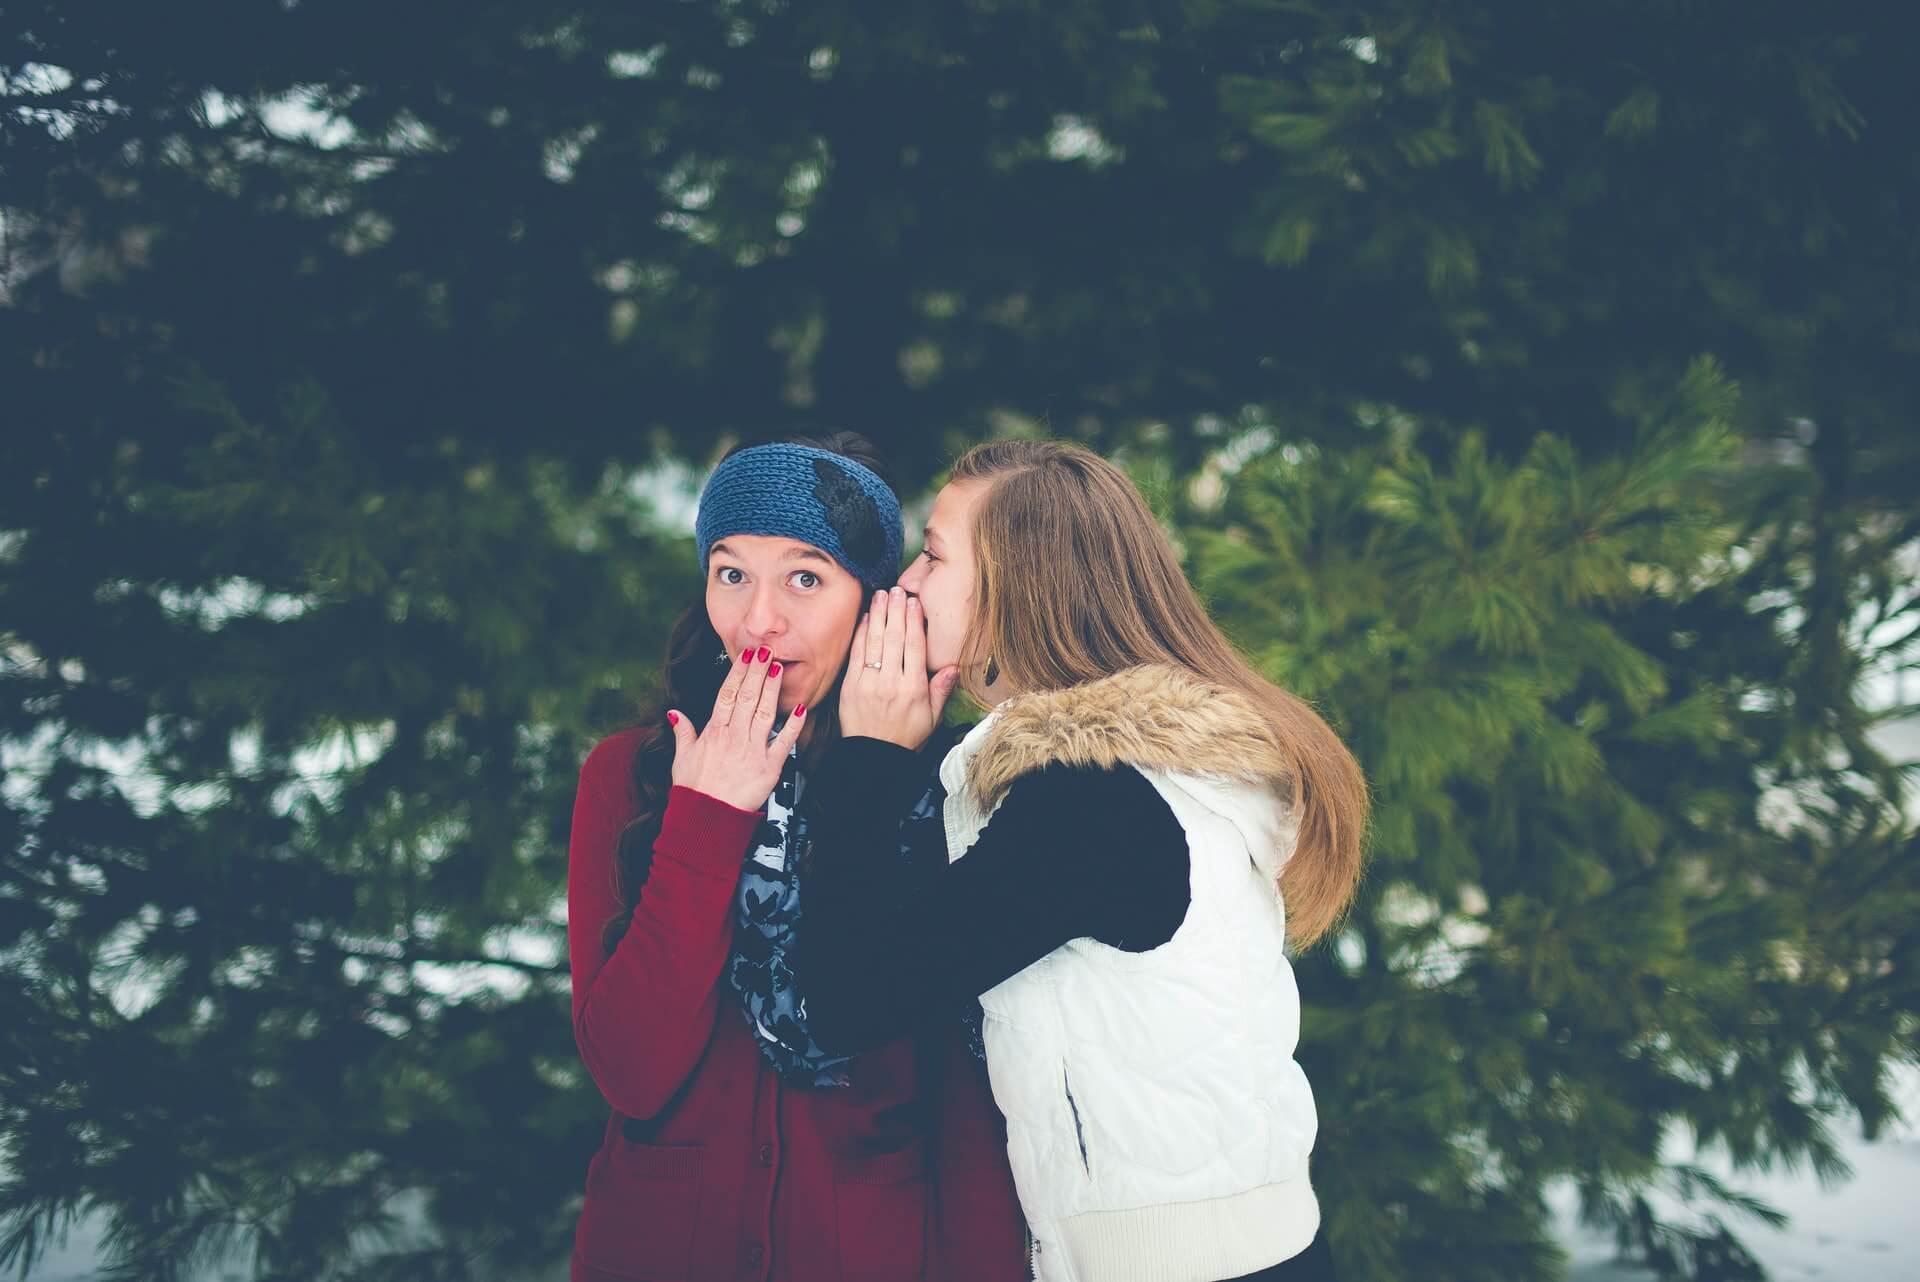 Choosing friends to help plan proposal